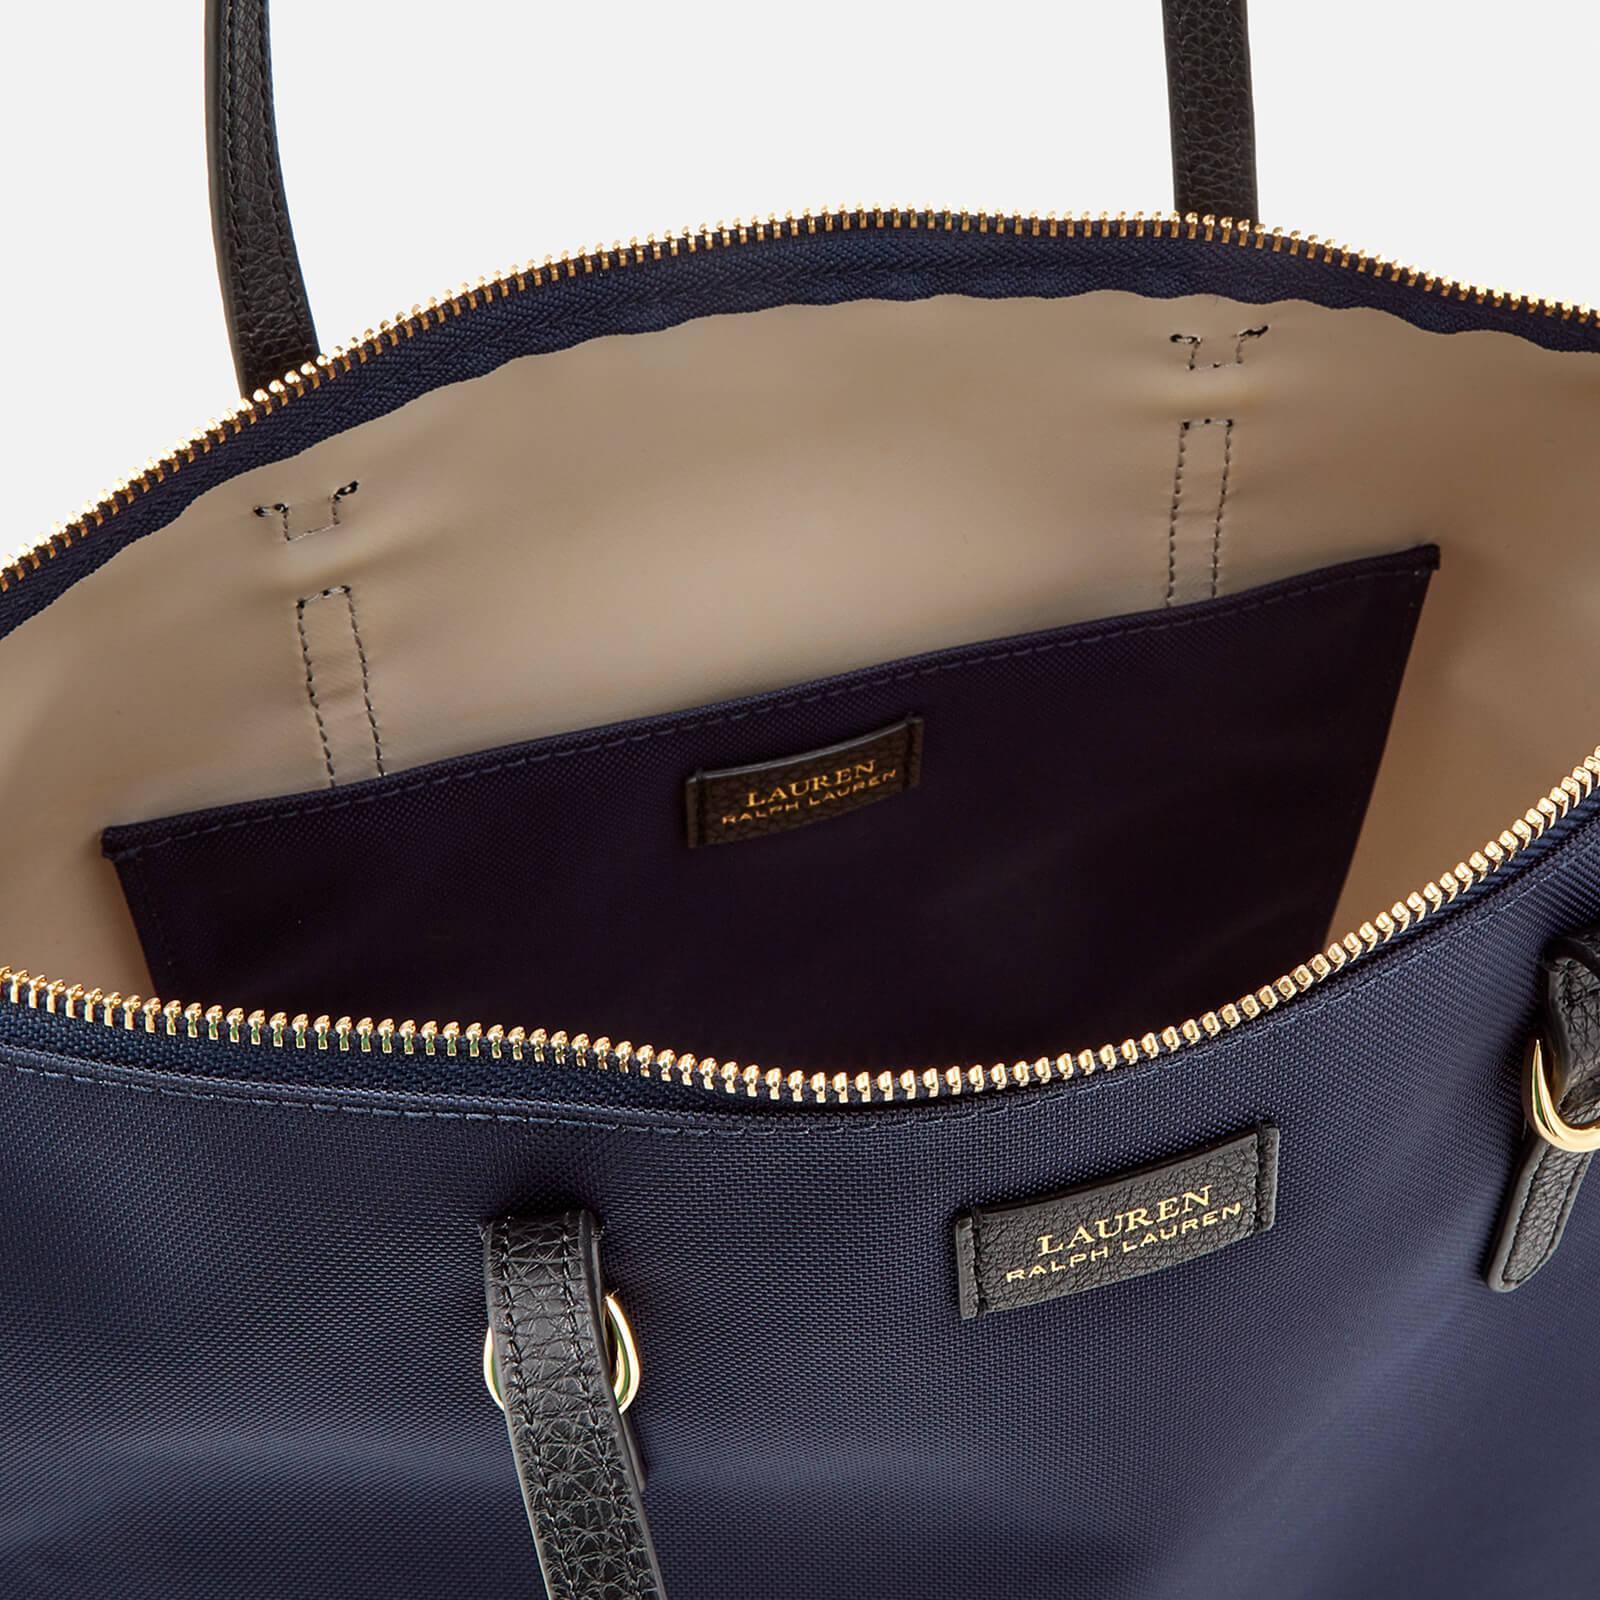 98ff1ac387291 Lauren by Ralph Lauren Chadwick Shopper Bag in Blue - Lyst